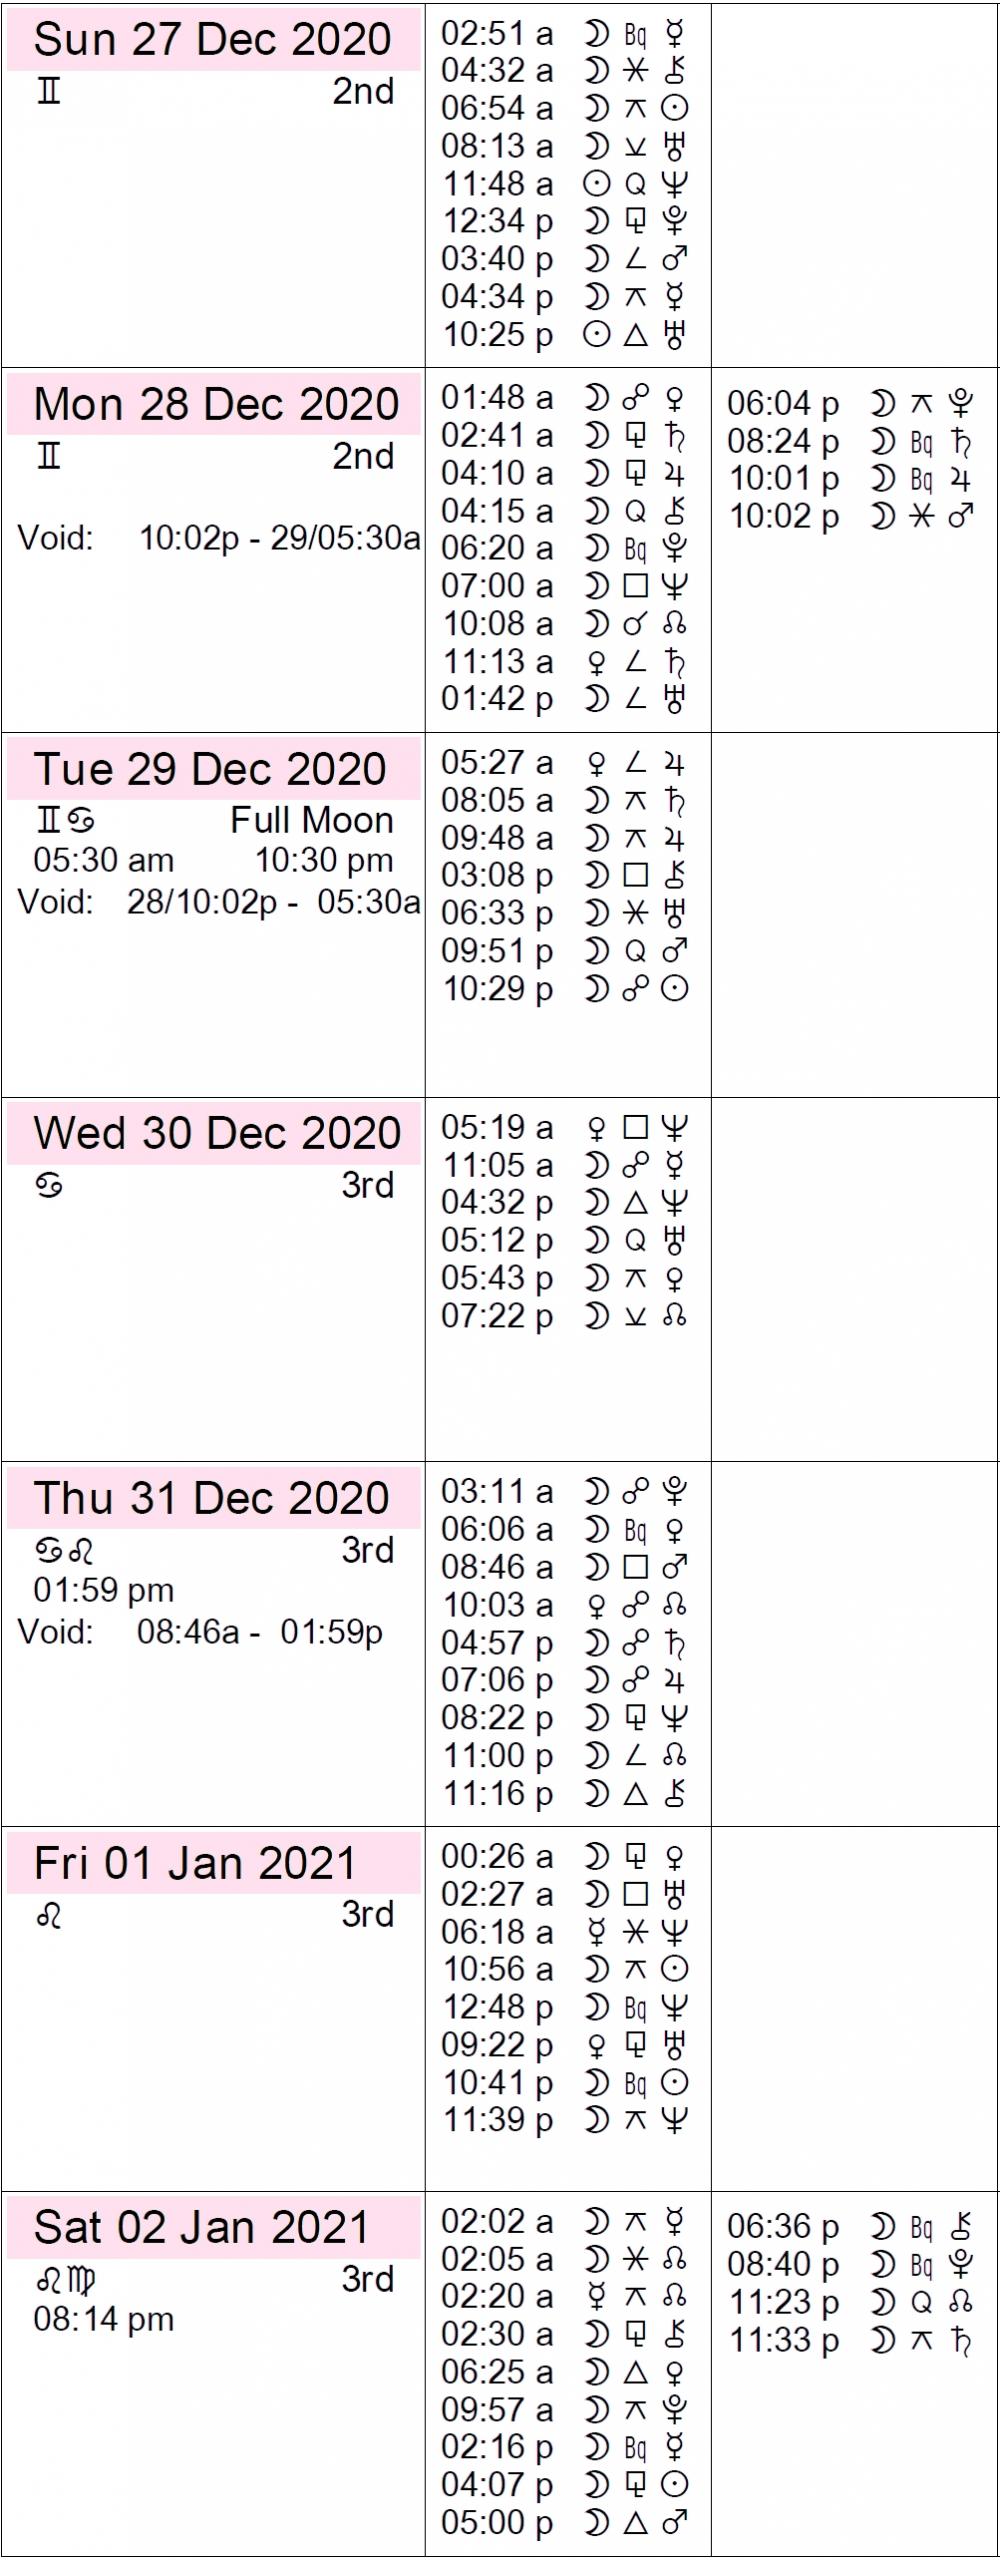 This Week In Astrology: November 29 To December 5, 2020